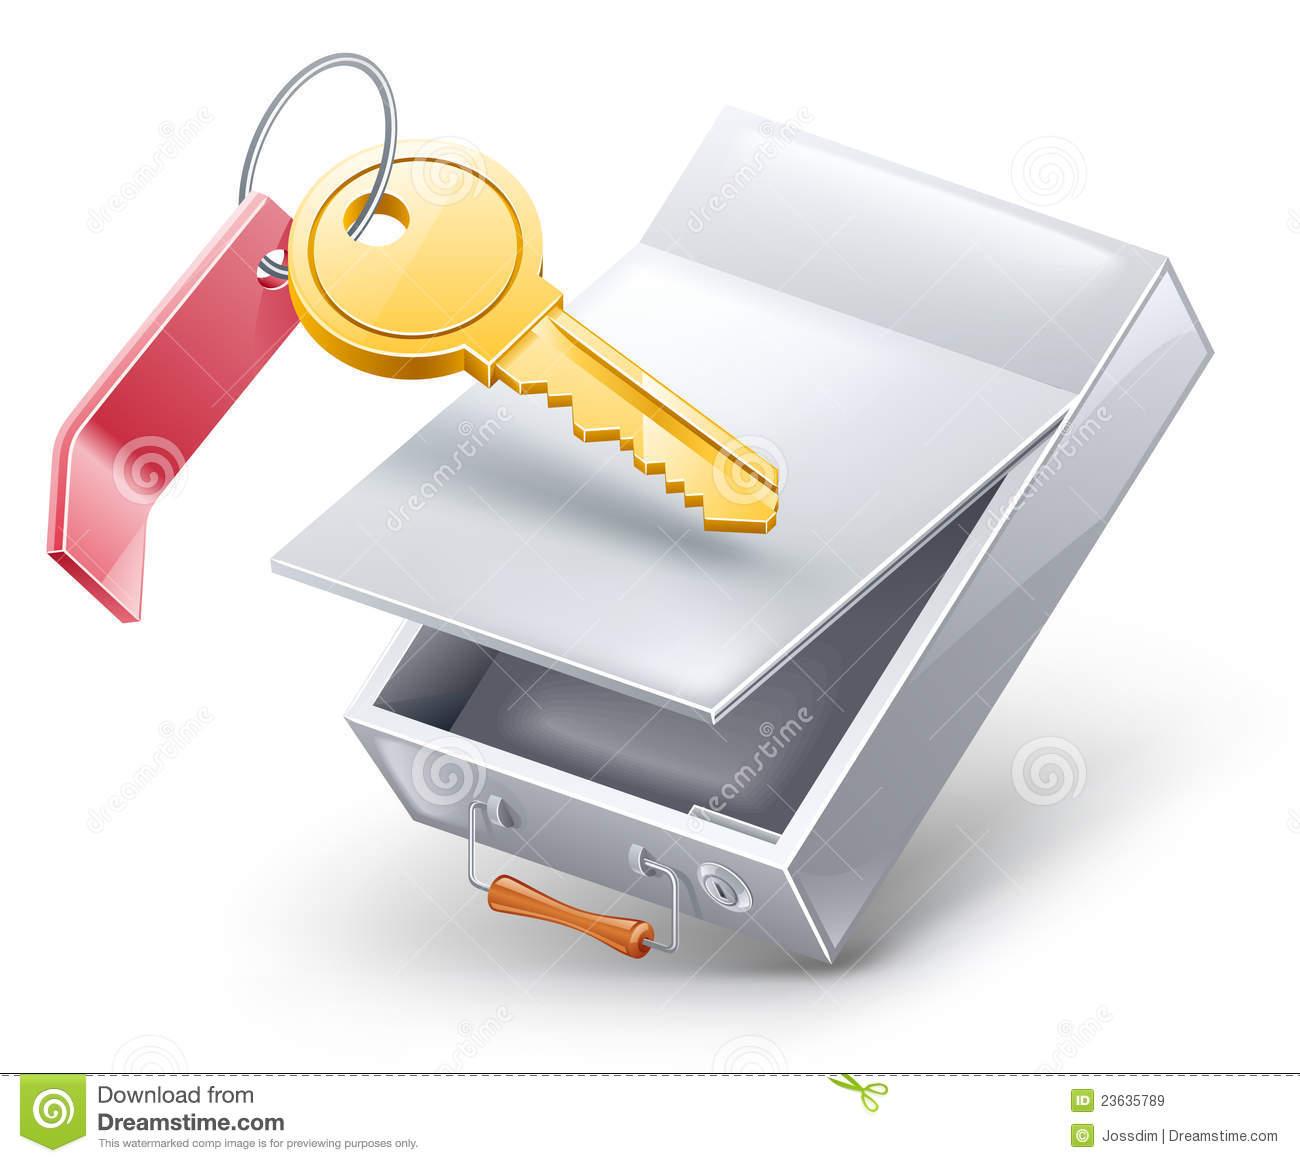 Safety deposit box clipart.